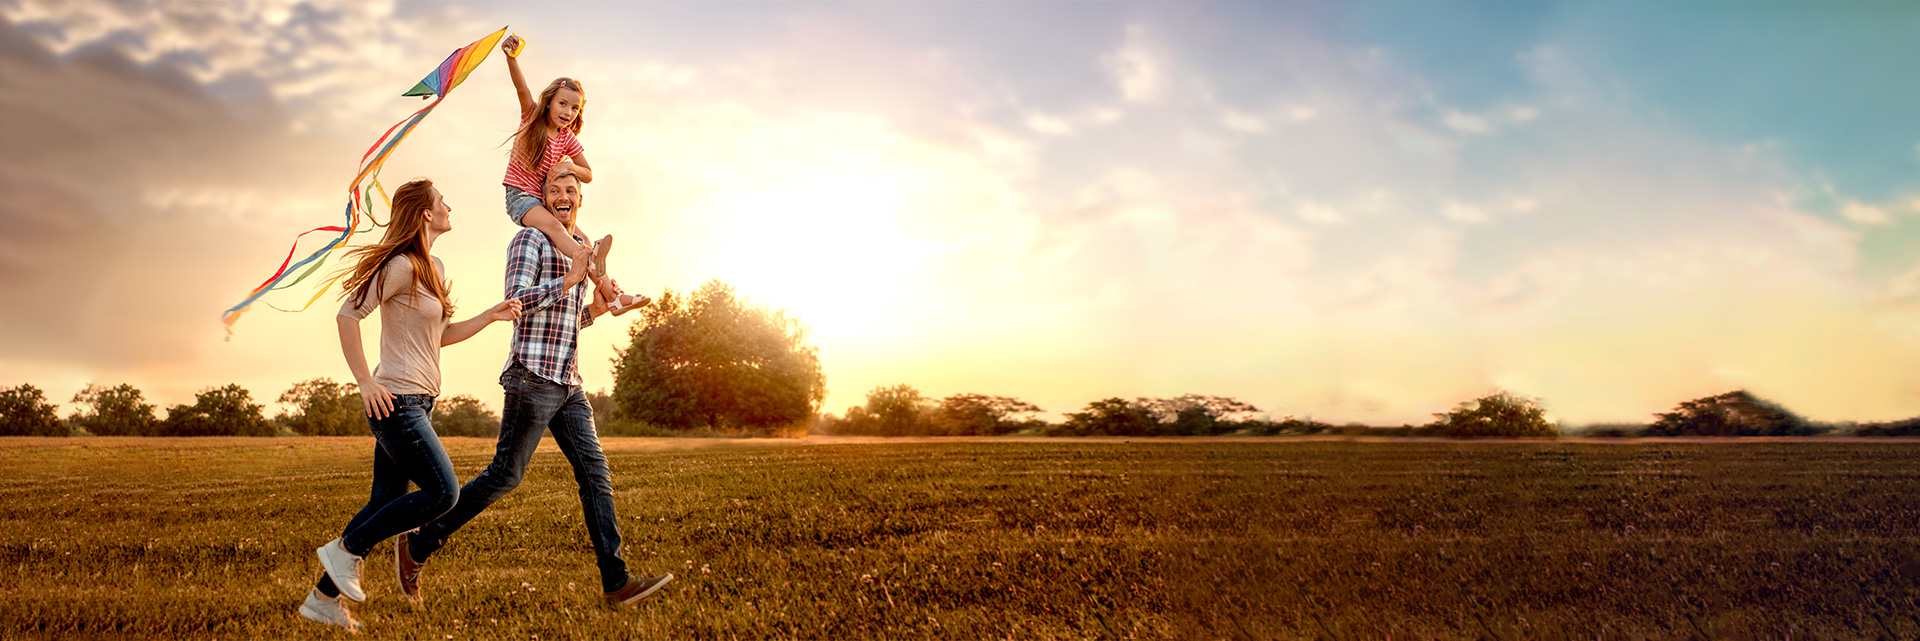 msp-developments-residential-slider-young-family-flying-kite-field_1920x641